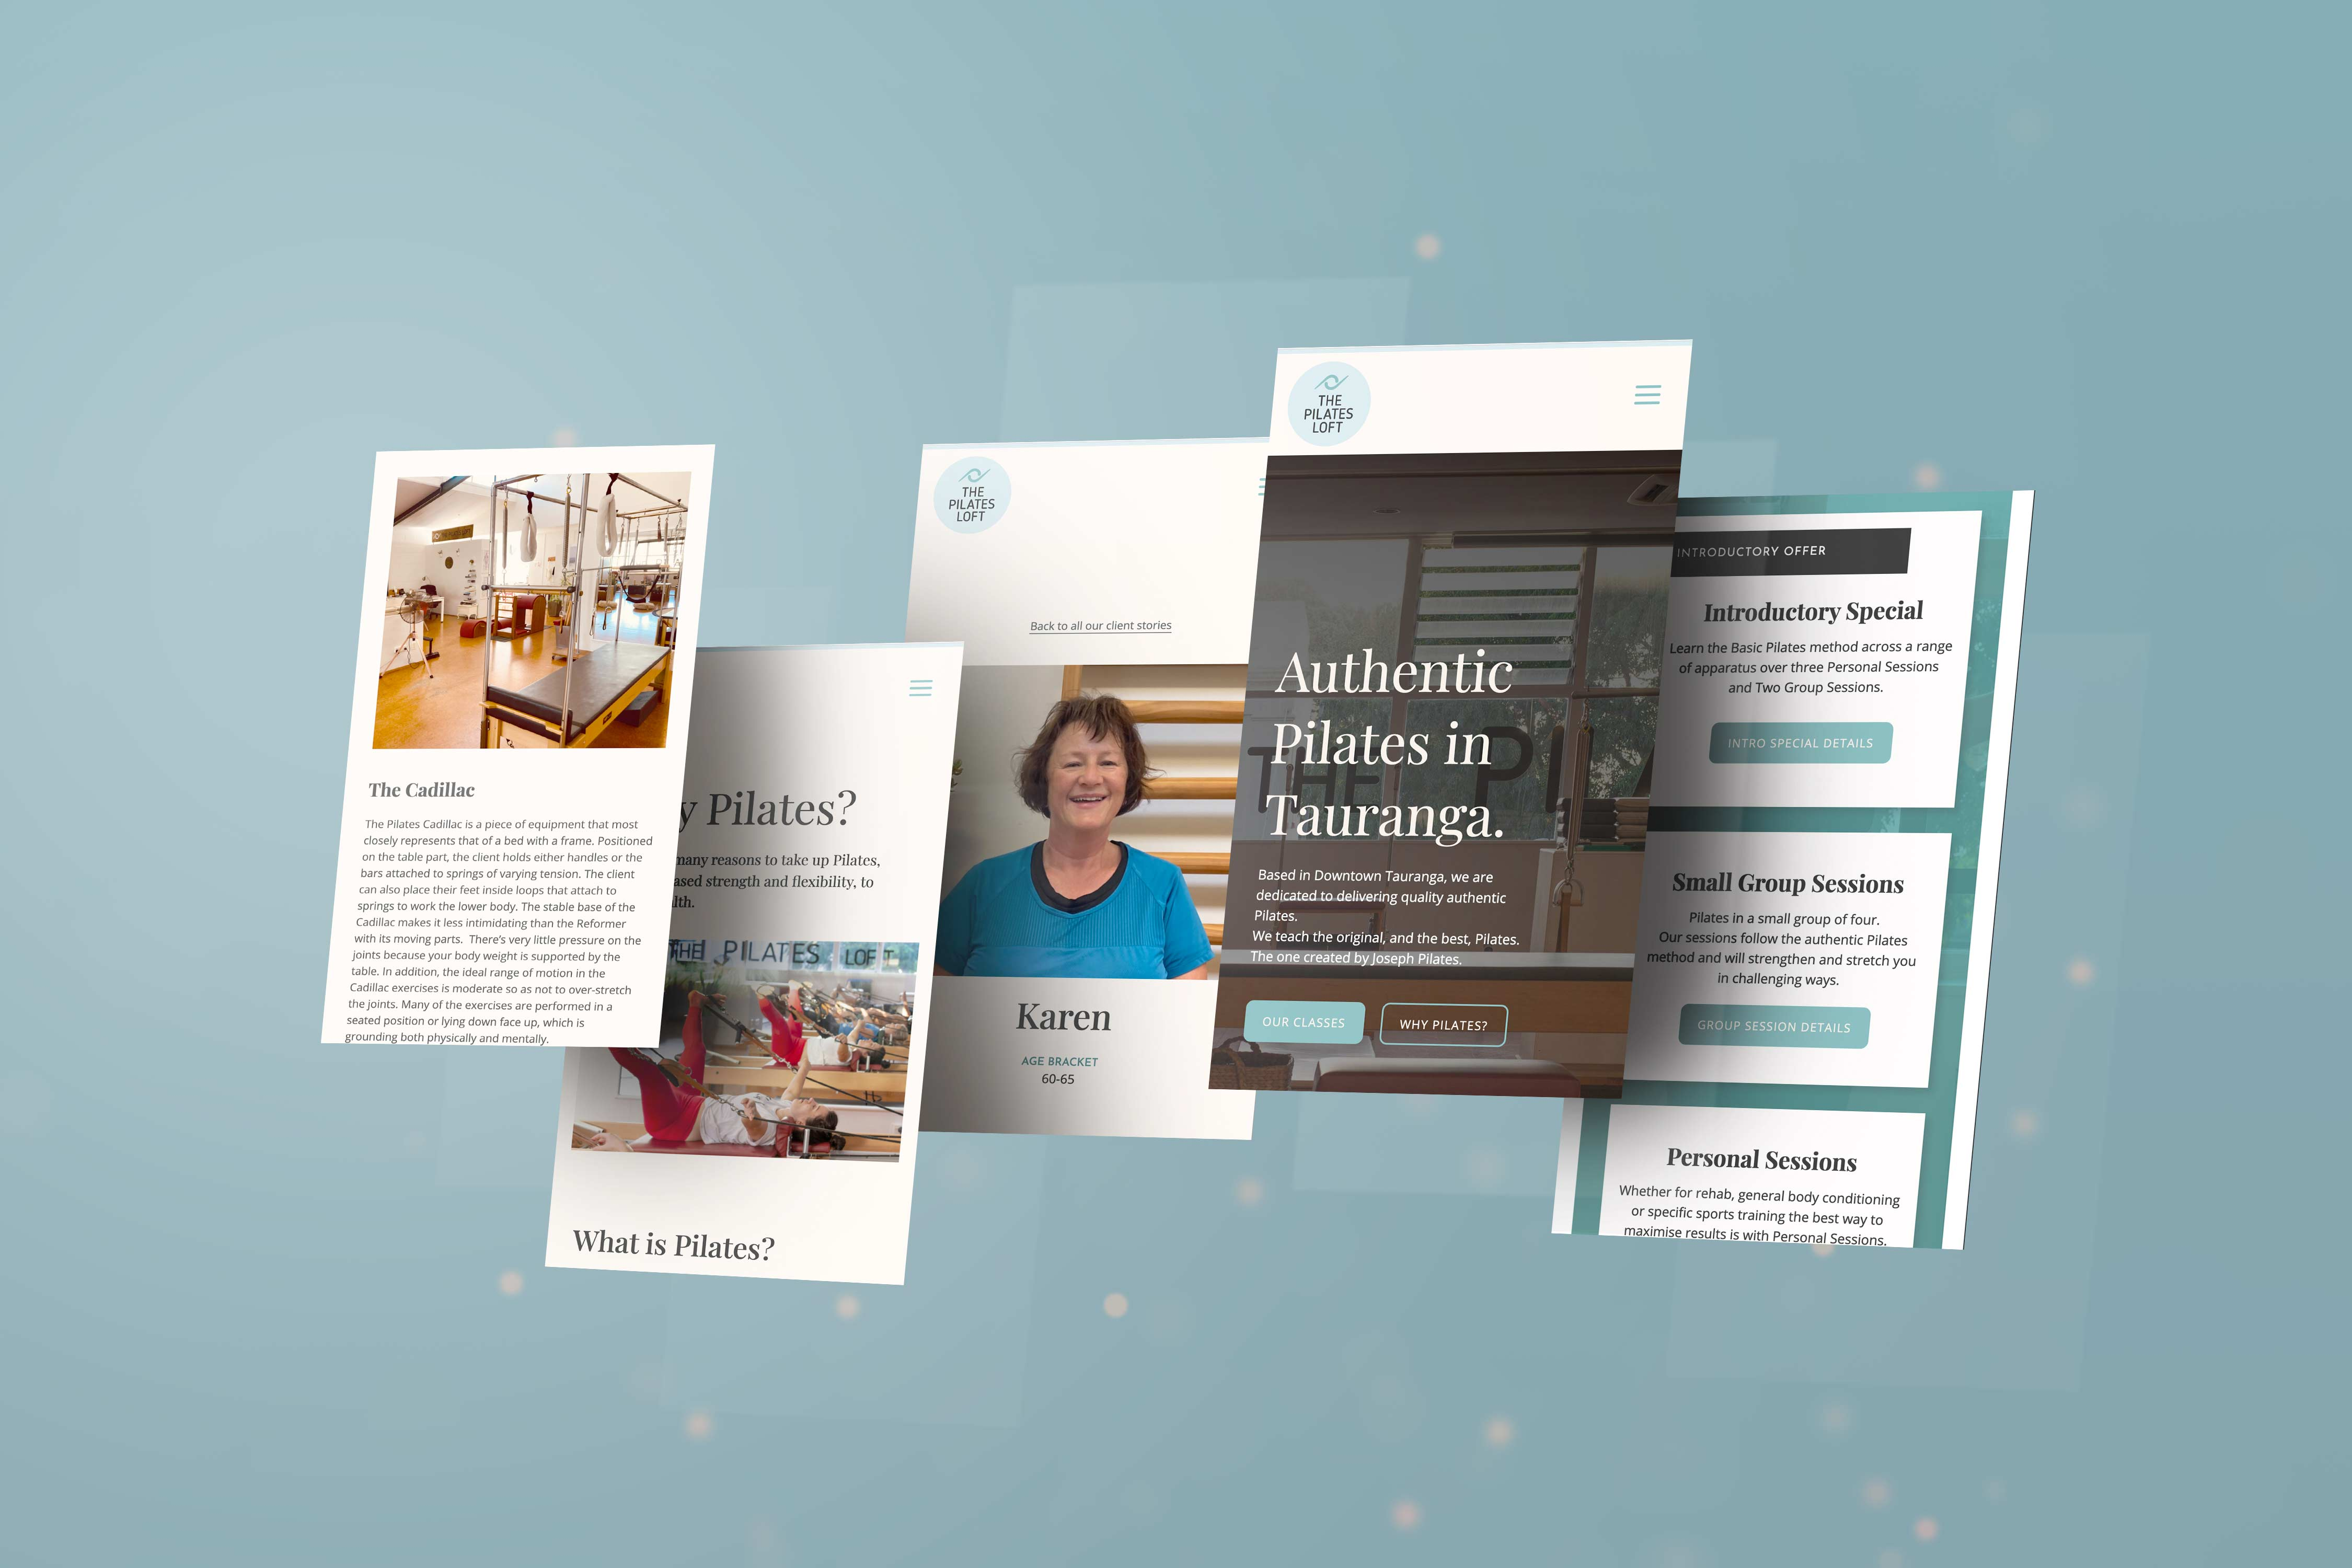 Showcasing how the new Pilates Loft website looks on mobile